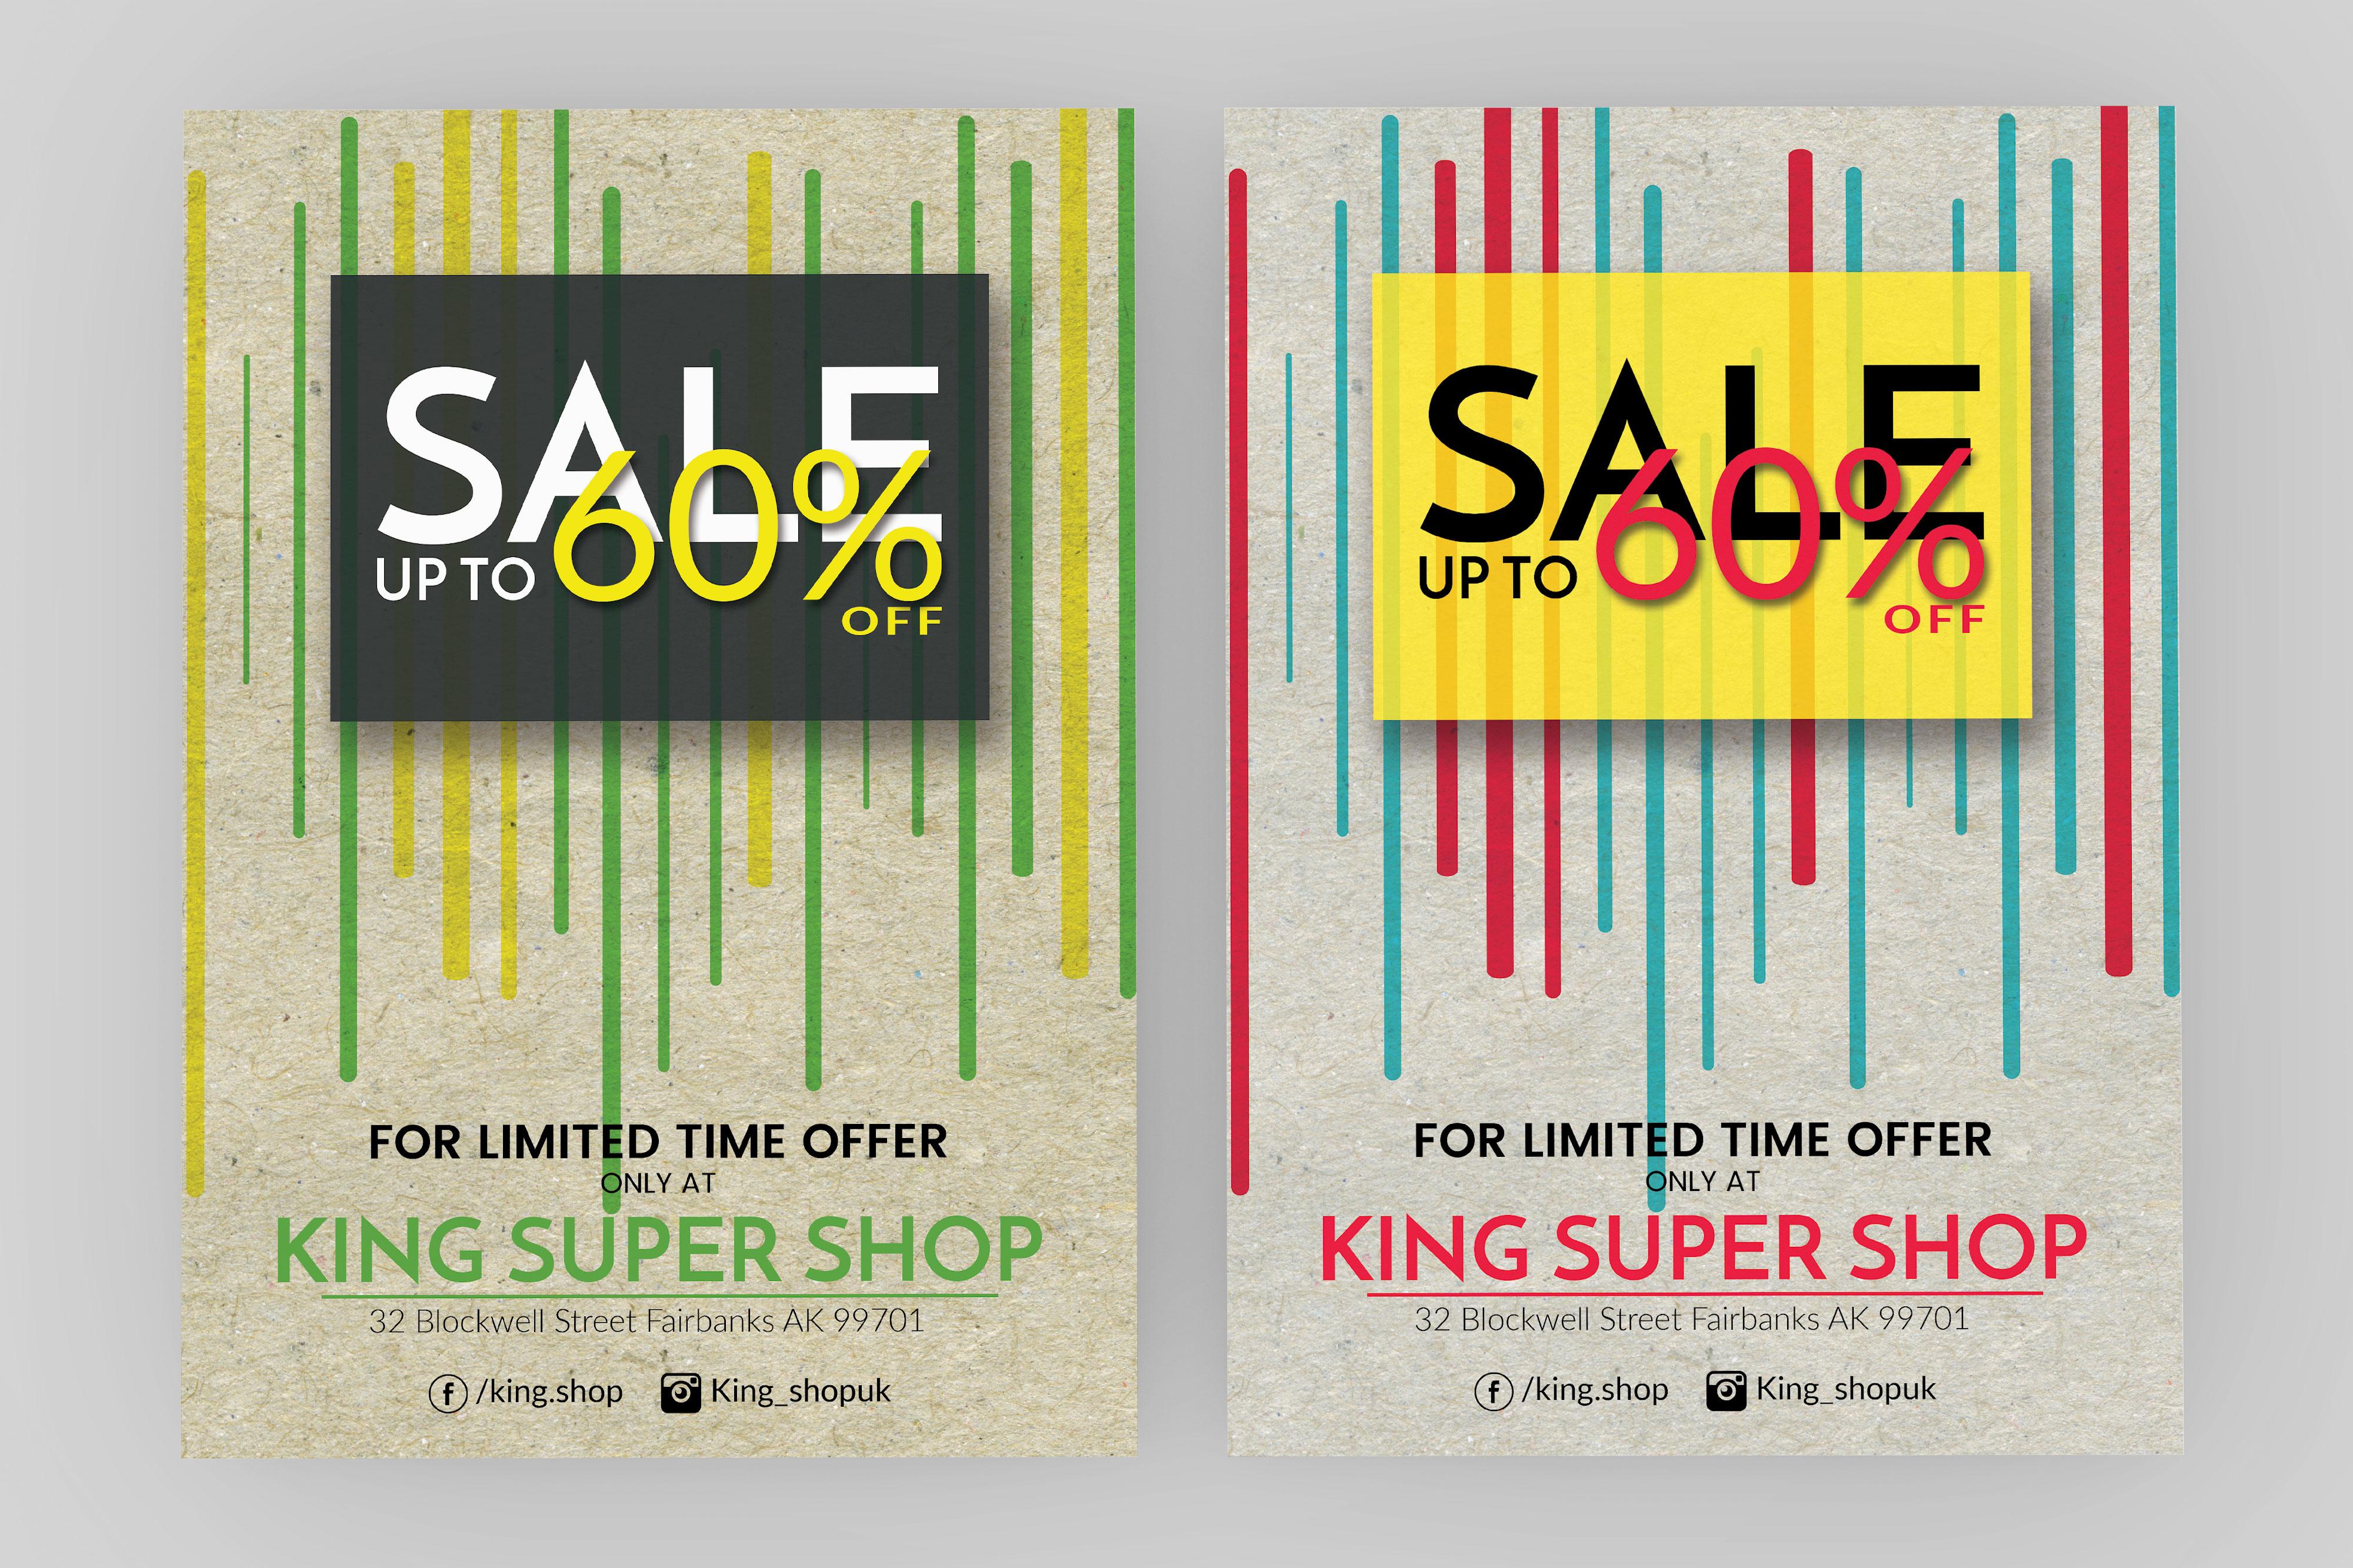 Shop Sale Flyer Design example image 4